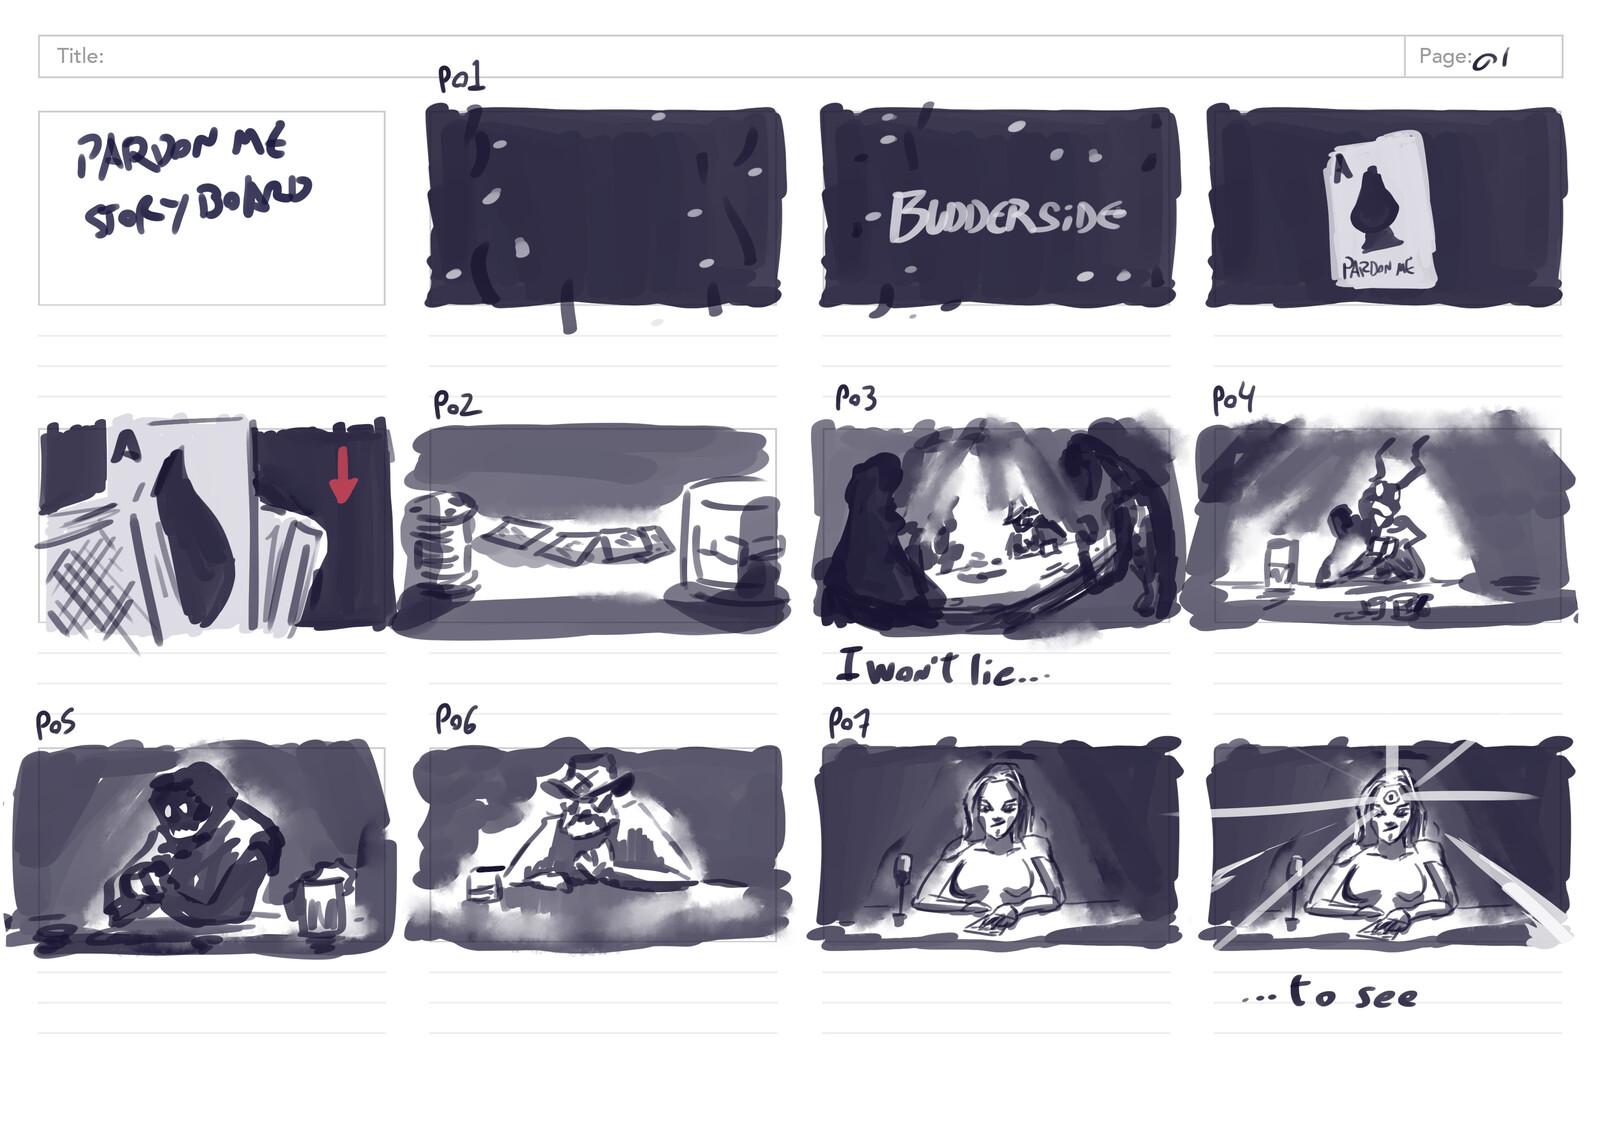 Storyboard 1/6